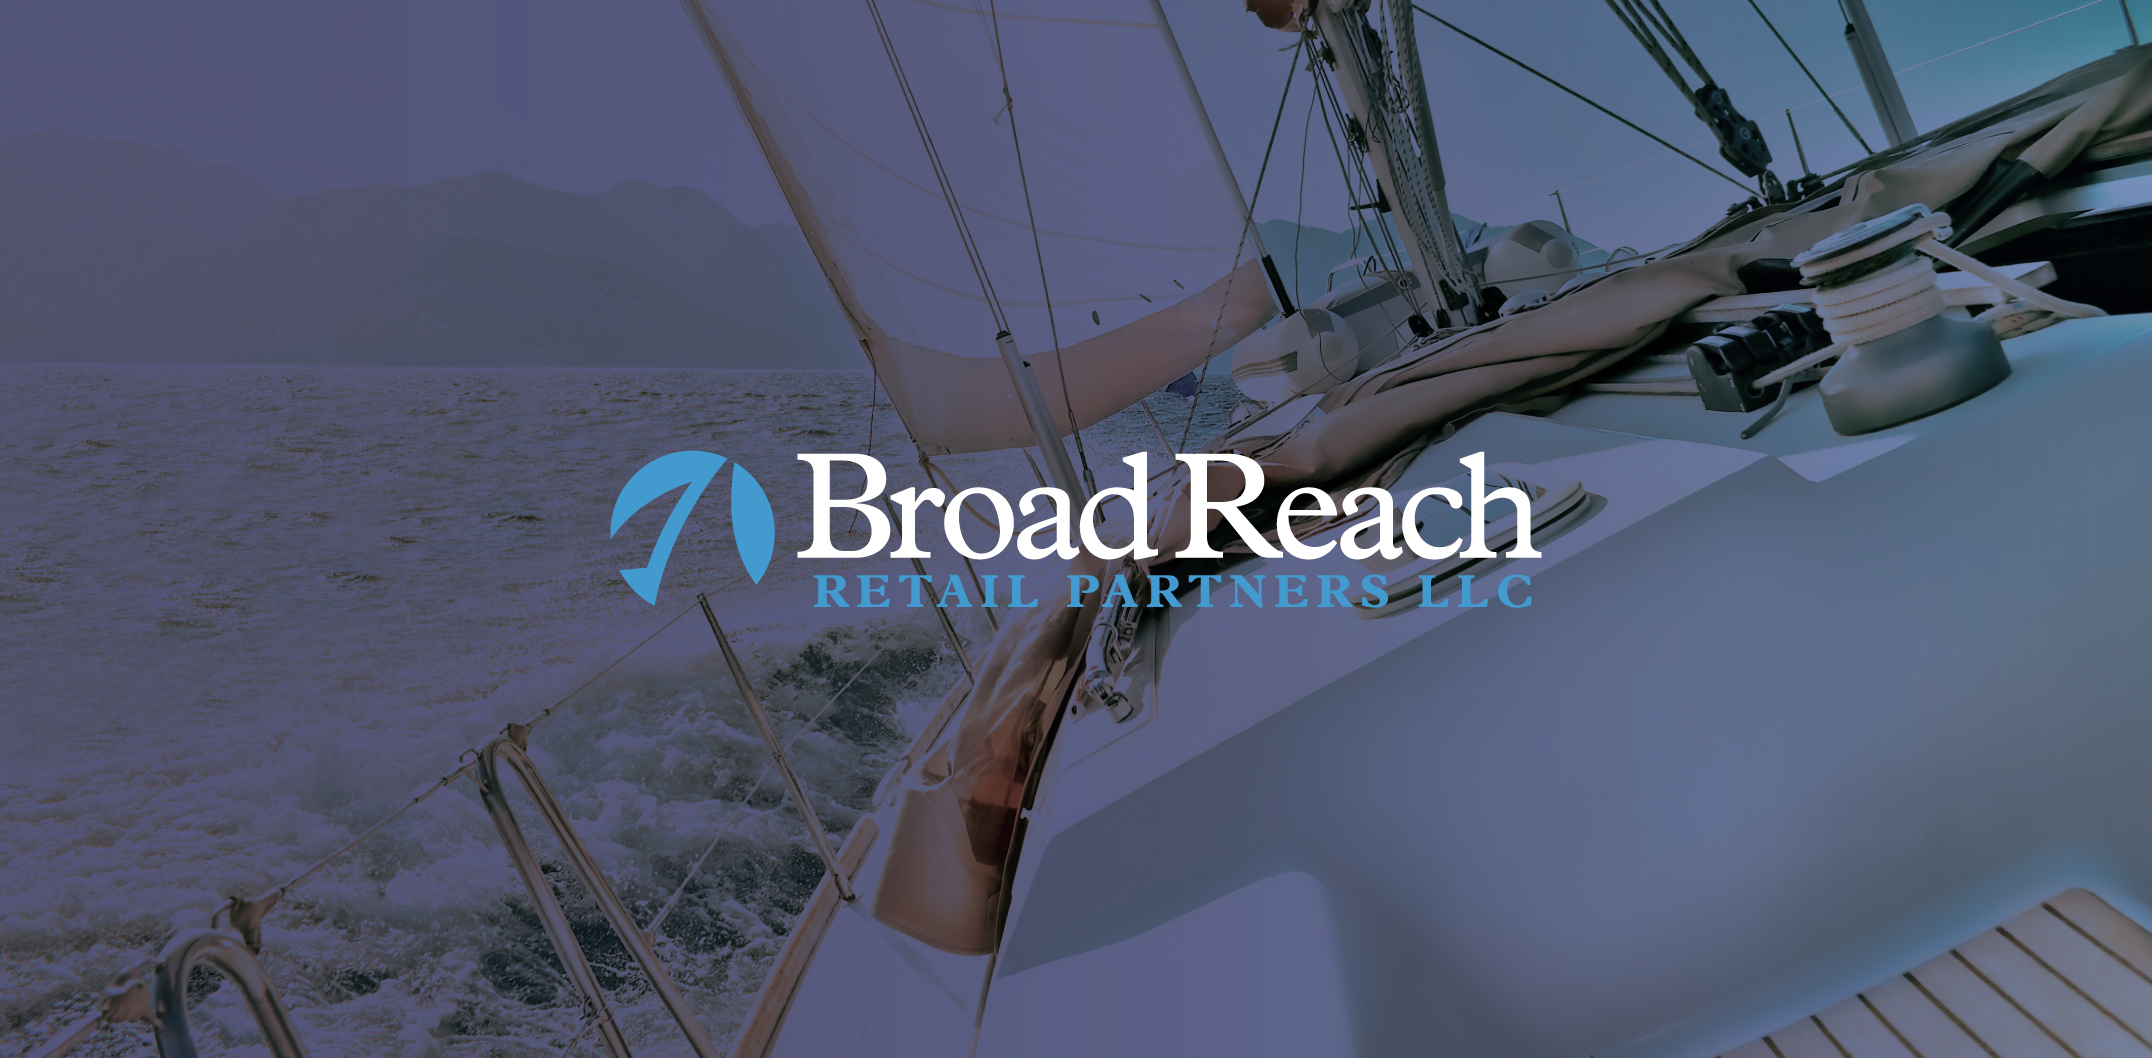 BroadReach_Case-study-graphics_1.jpg